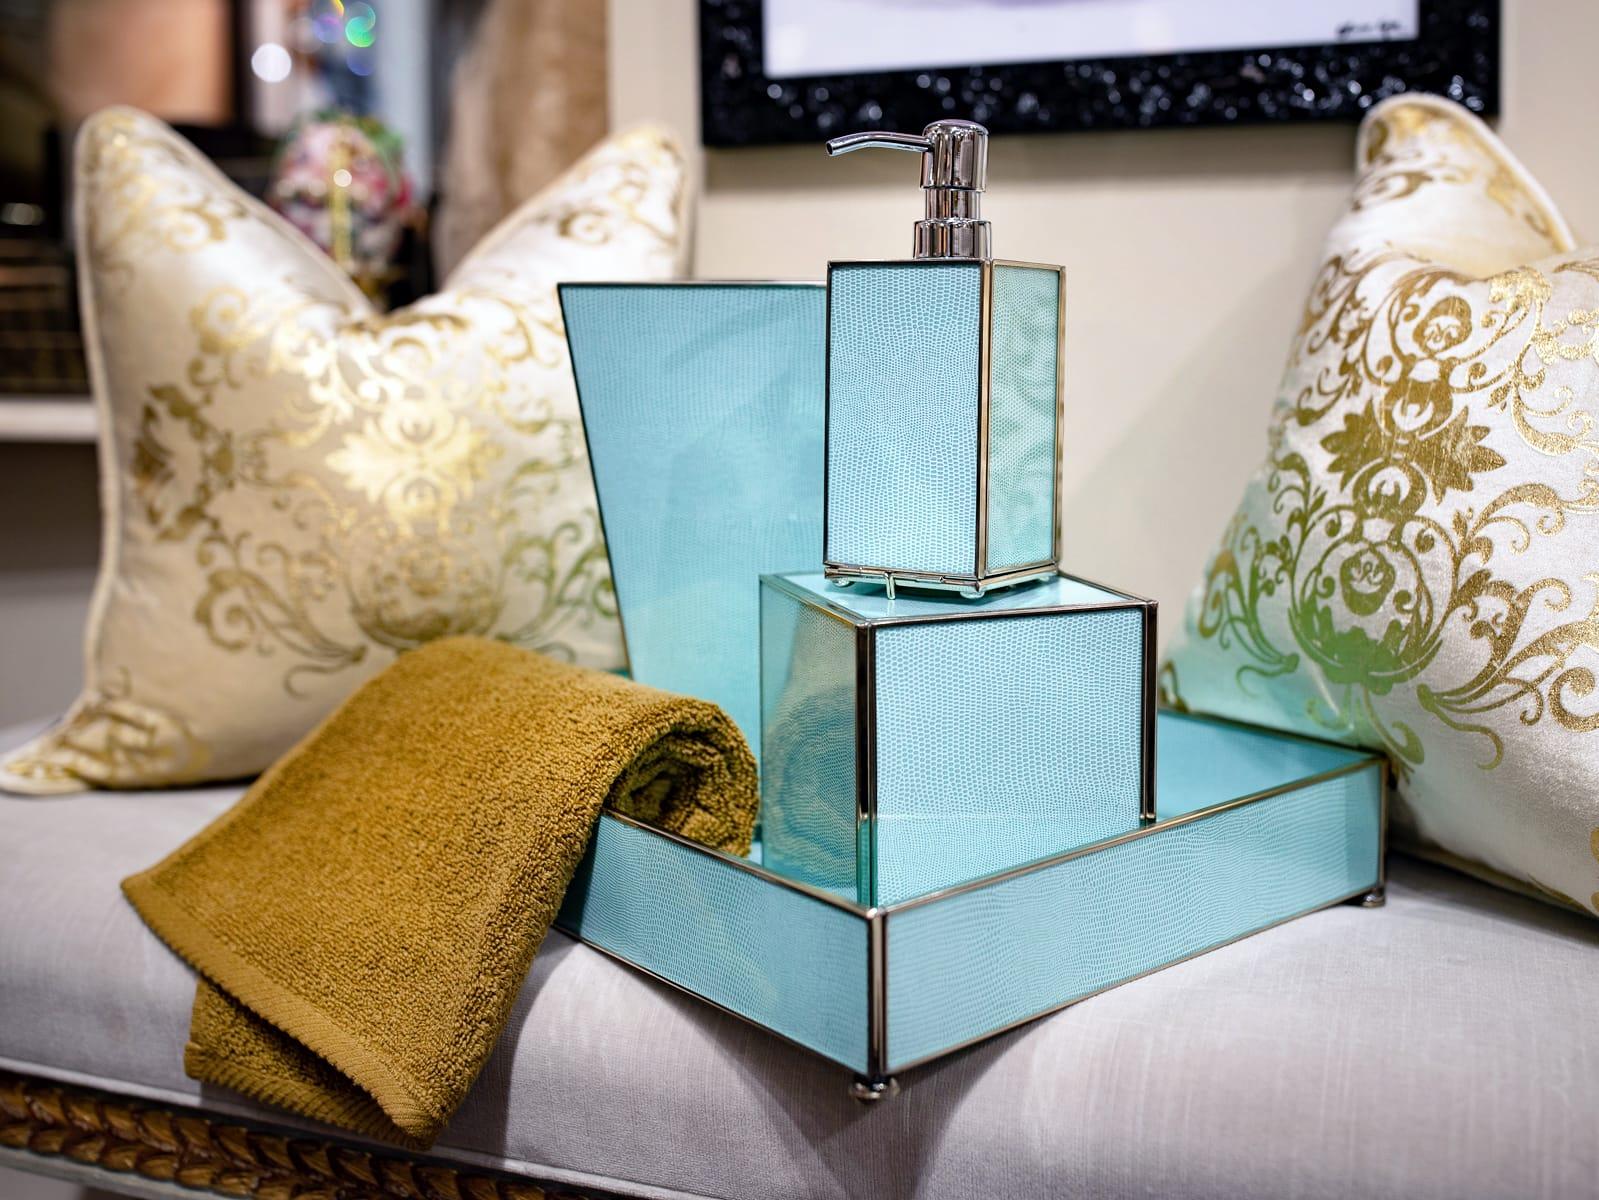 , New Home Decor & Fine Furniture Settings